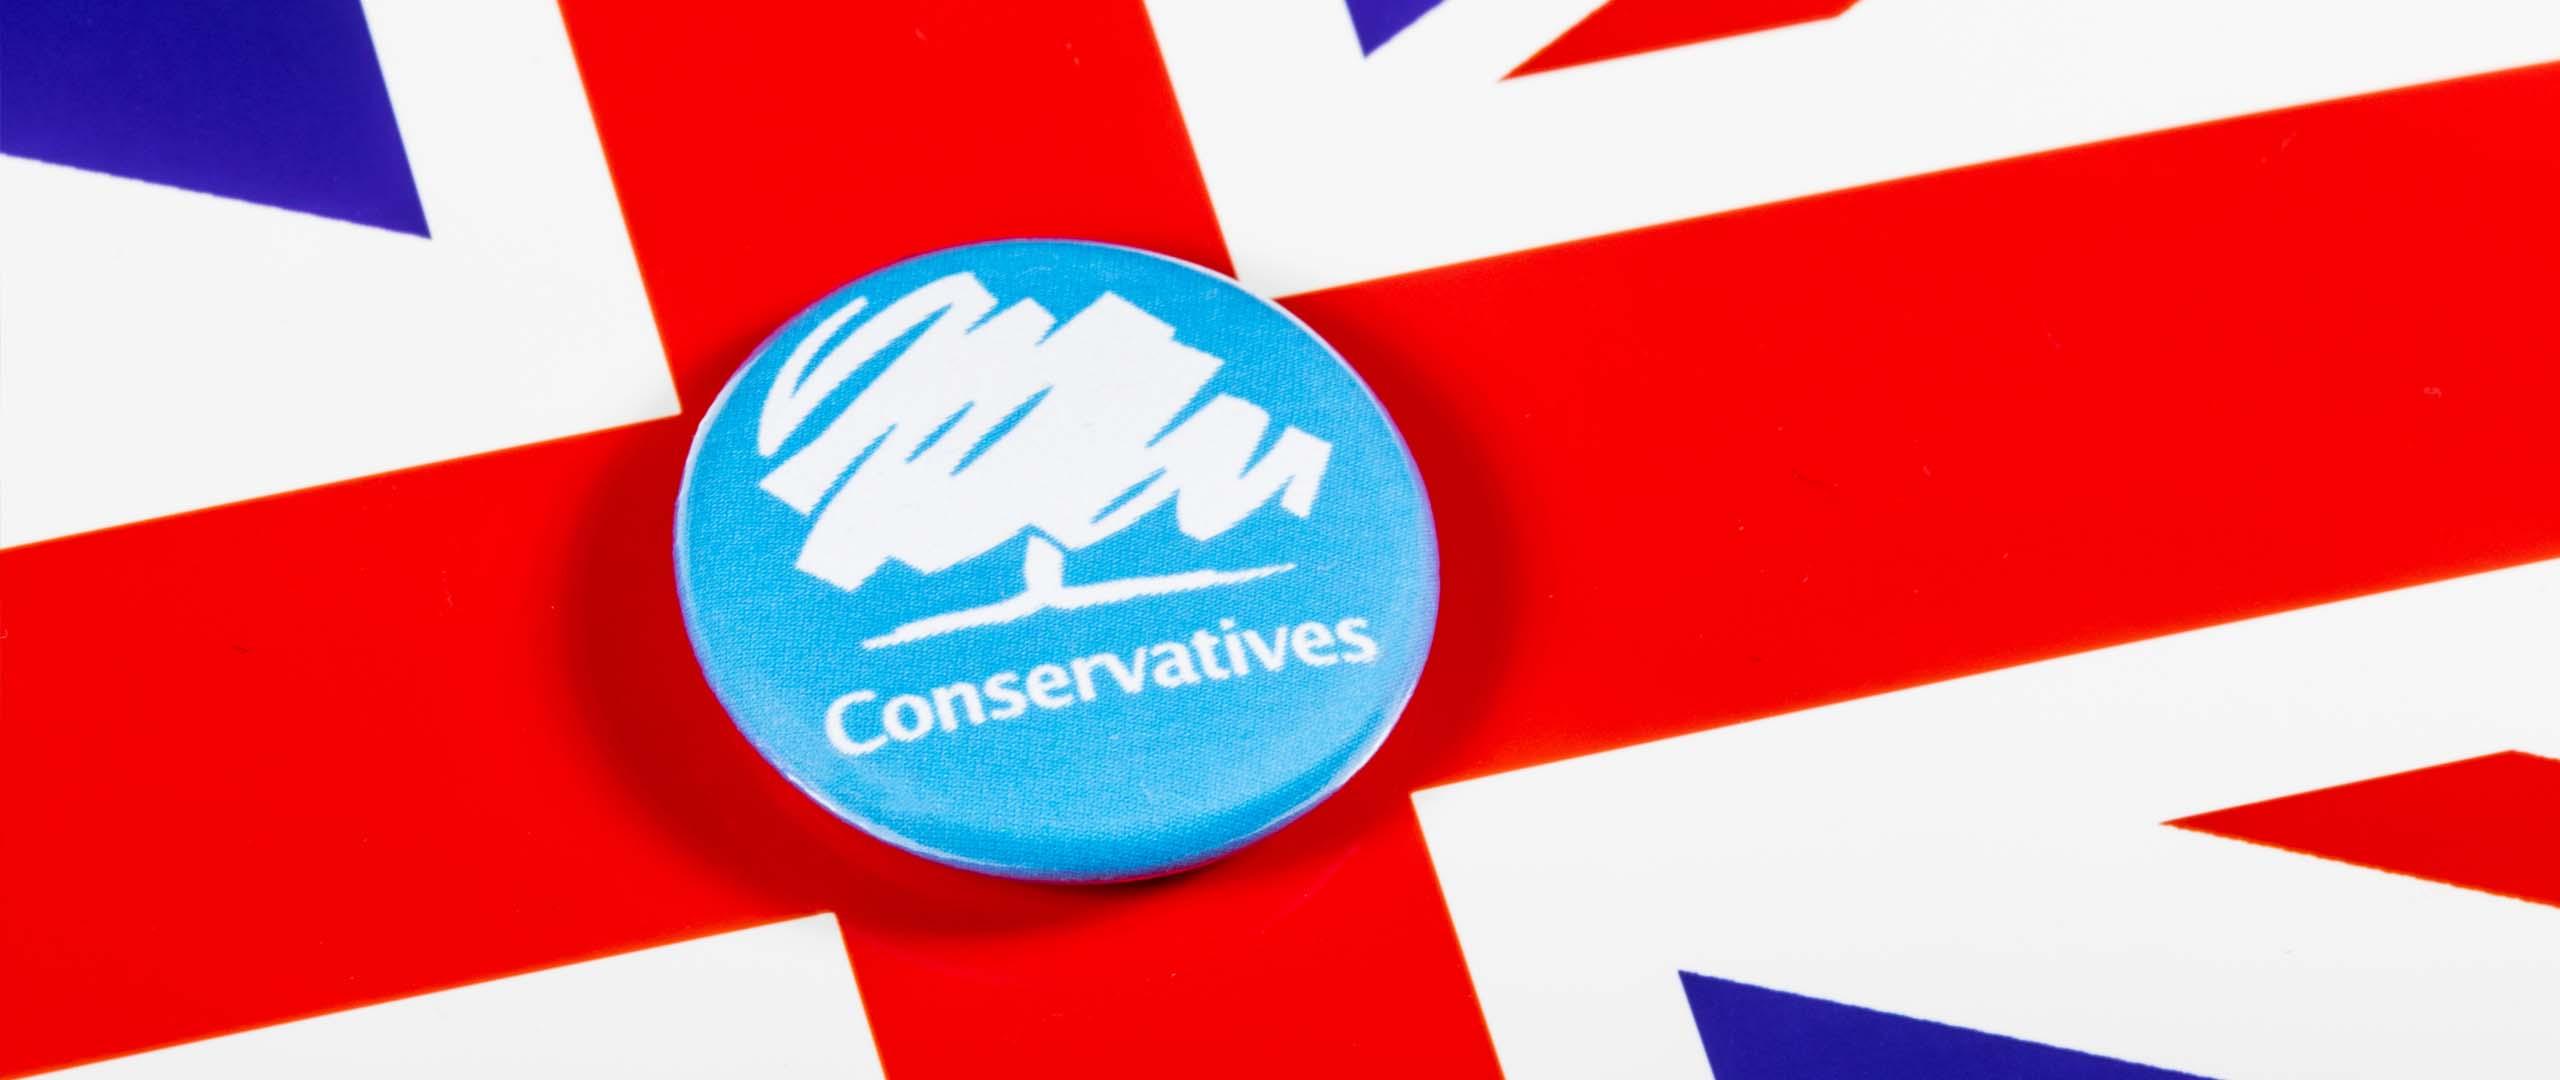 conservative background